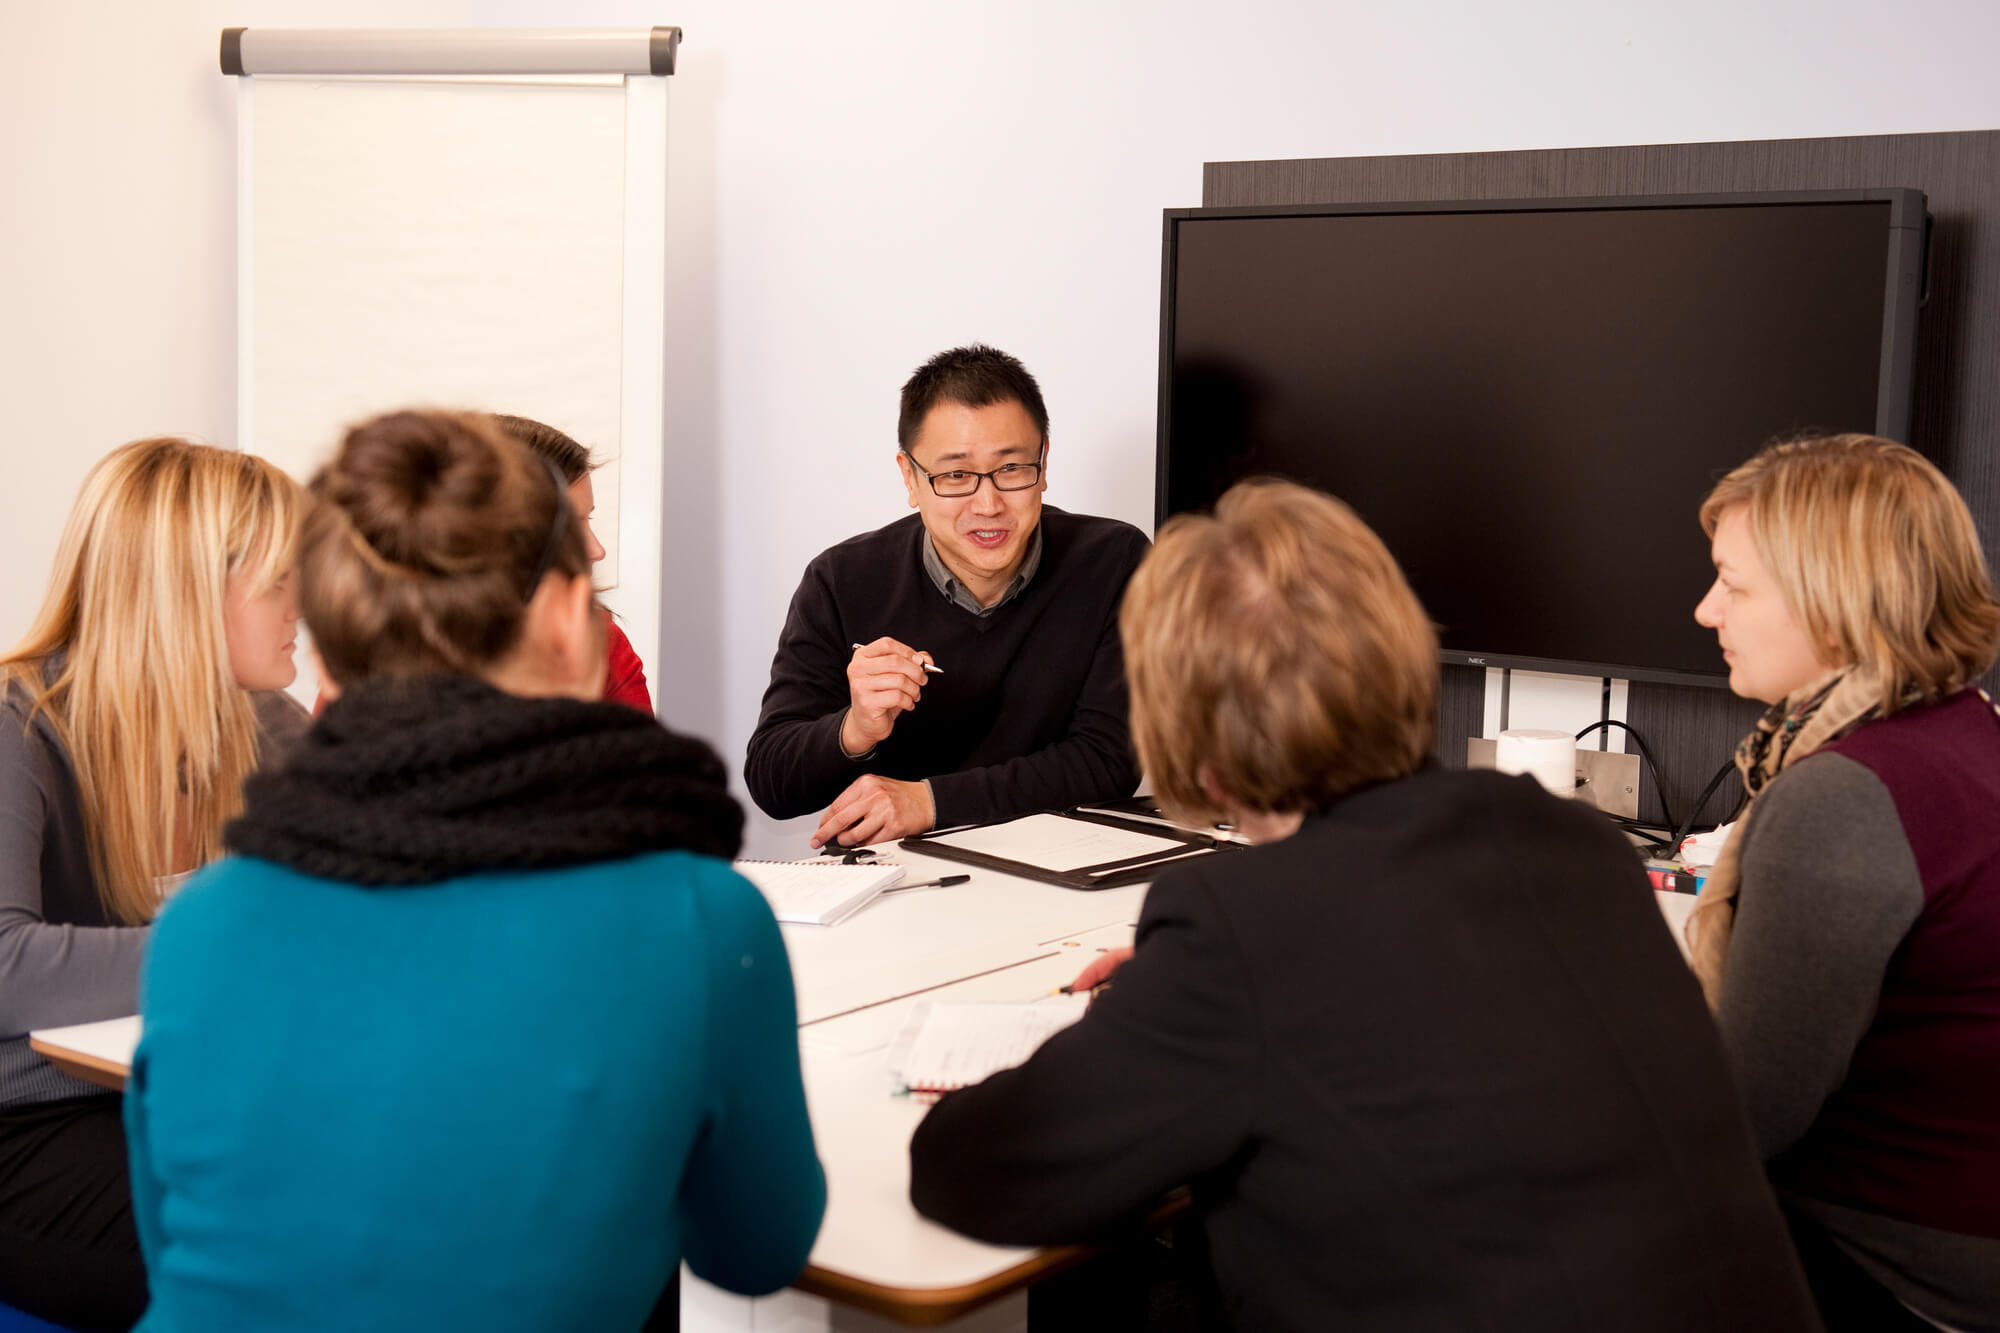 postgraduates discussing ideas at an event